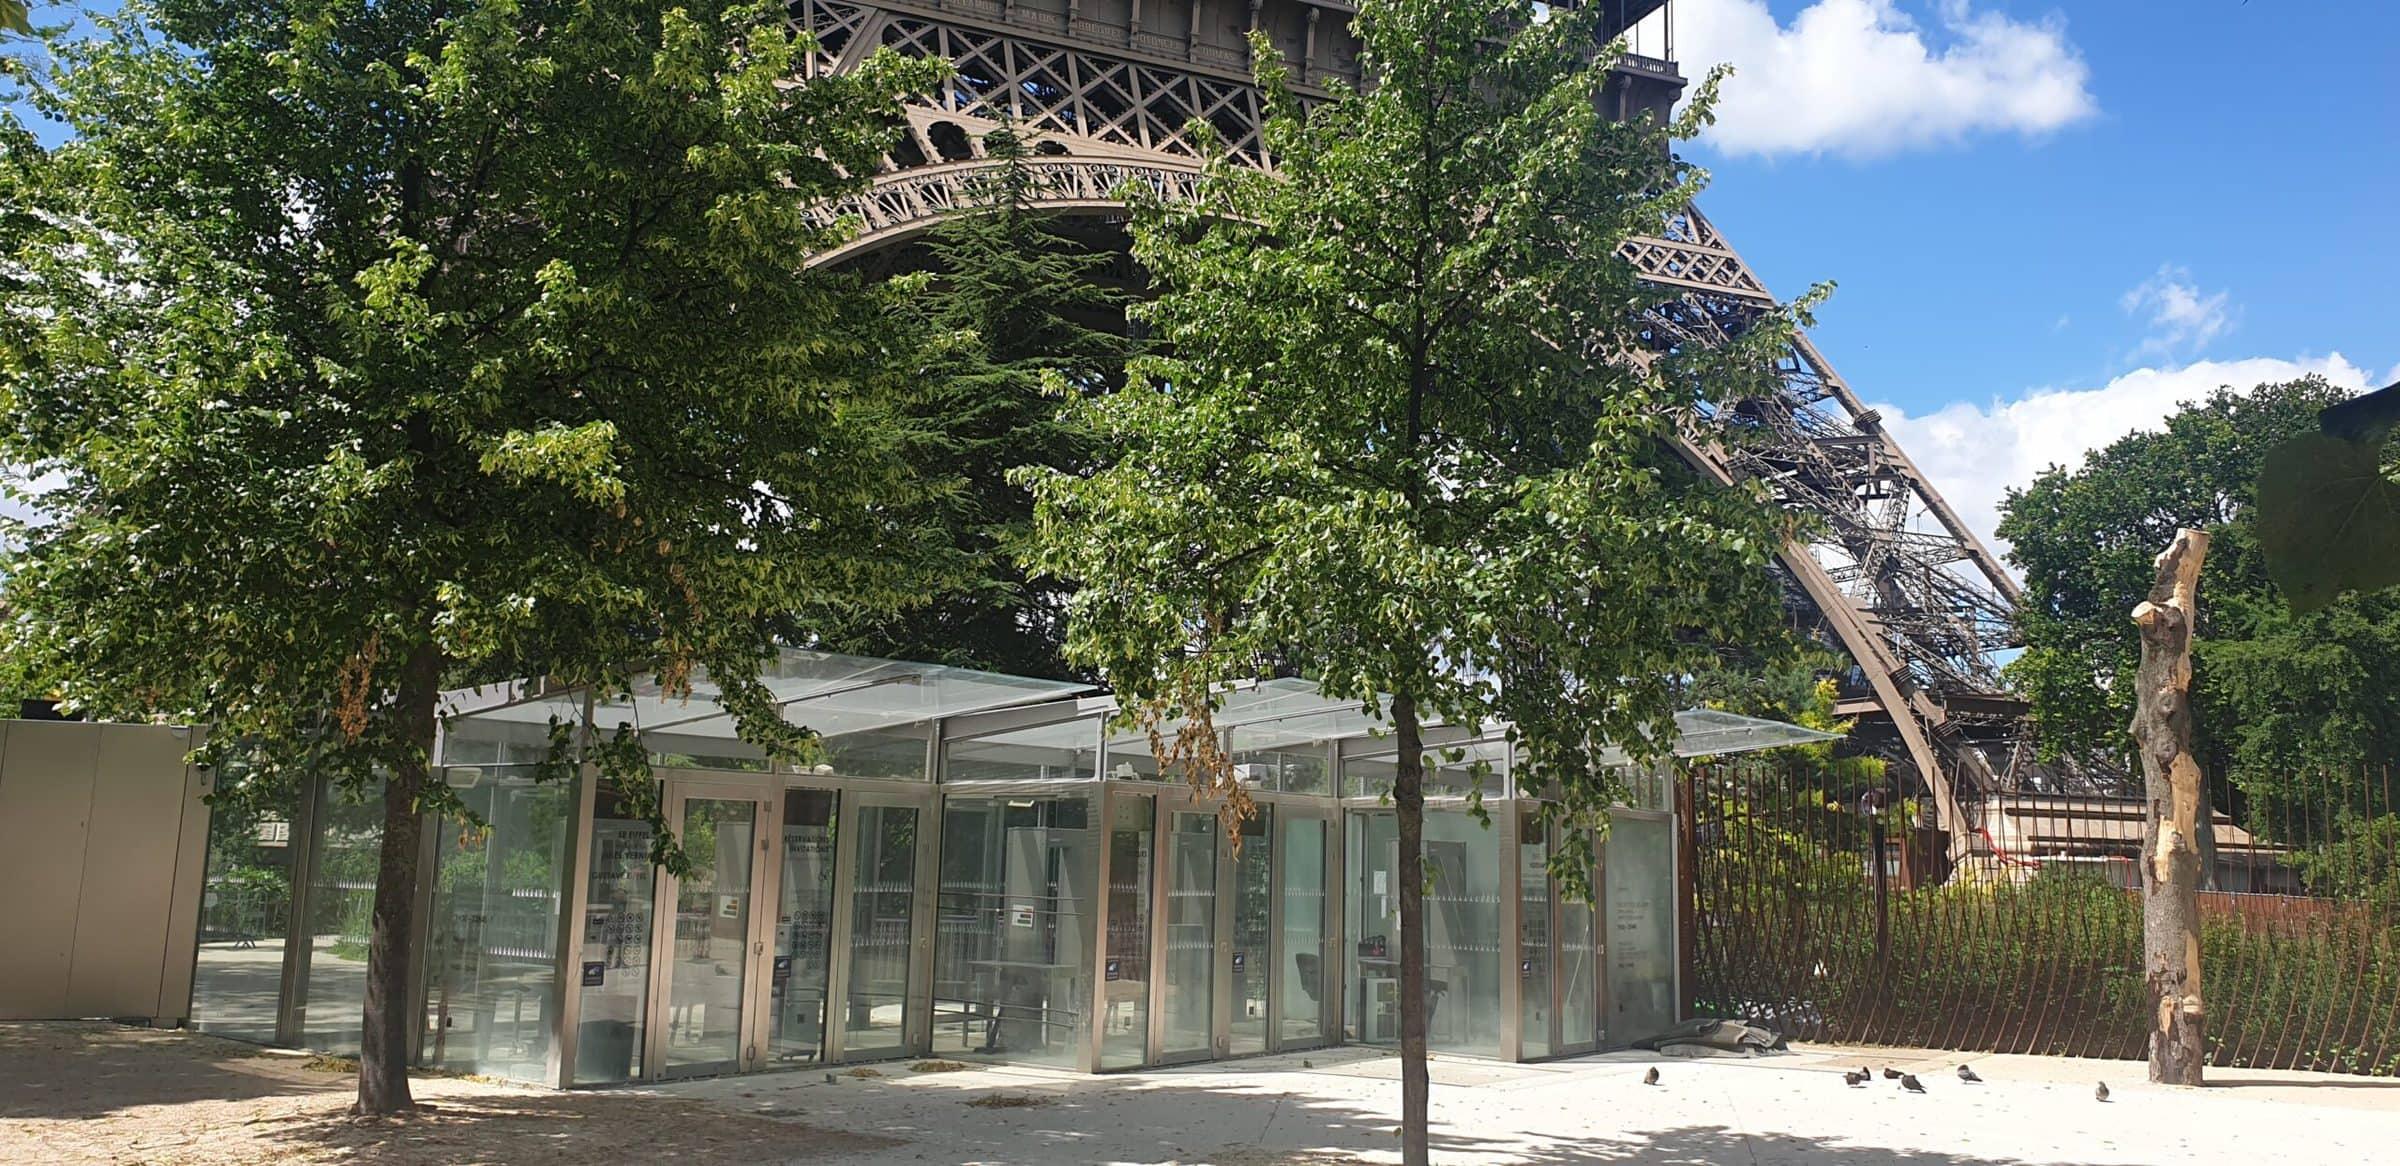 Eiffelturm, Paris, während Corona